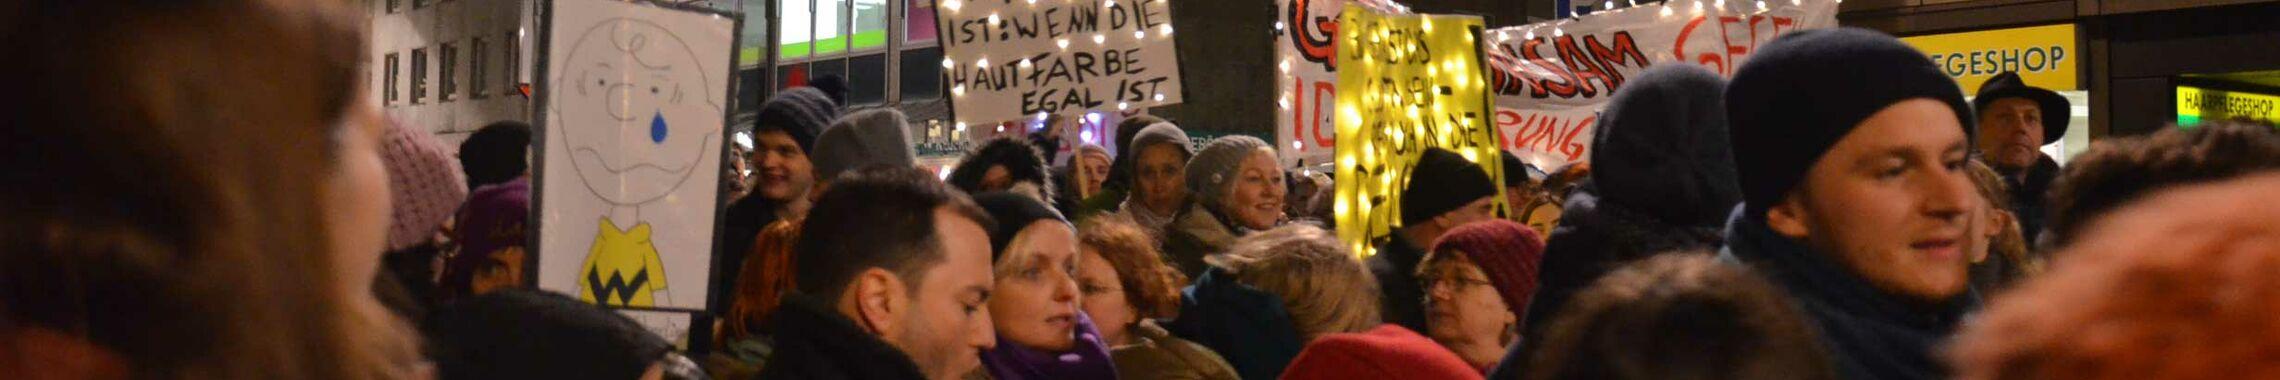 anti_hagida_schmal